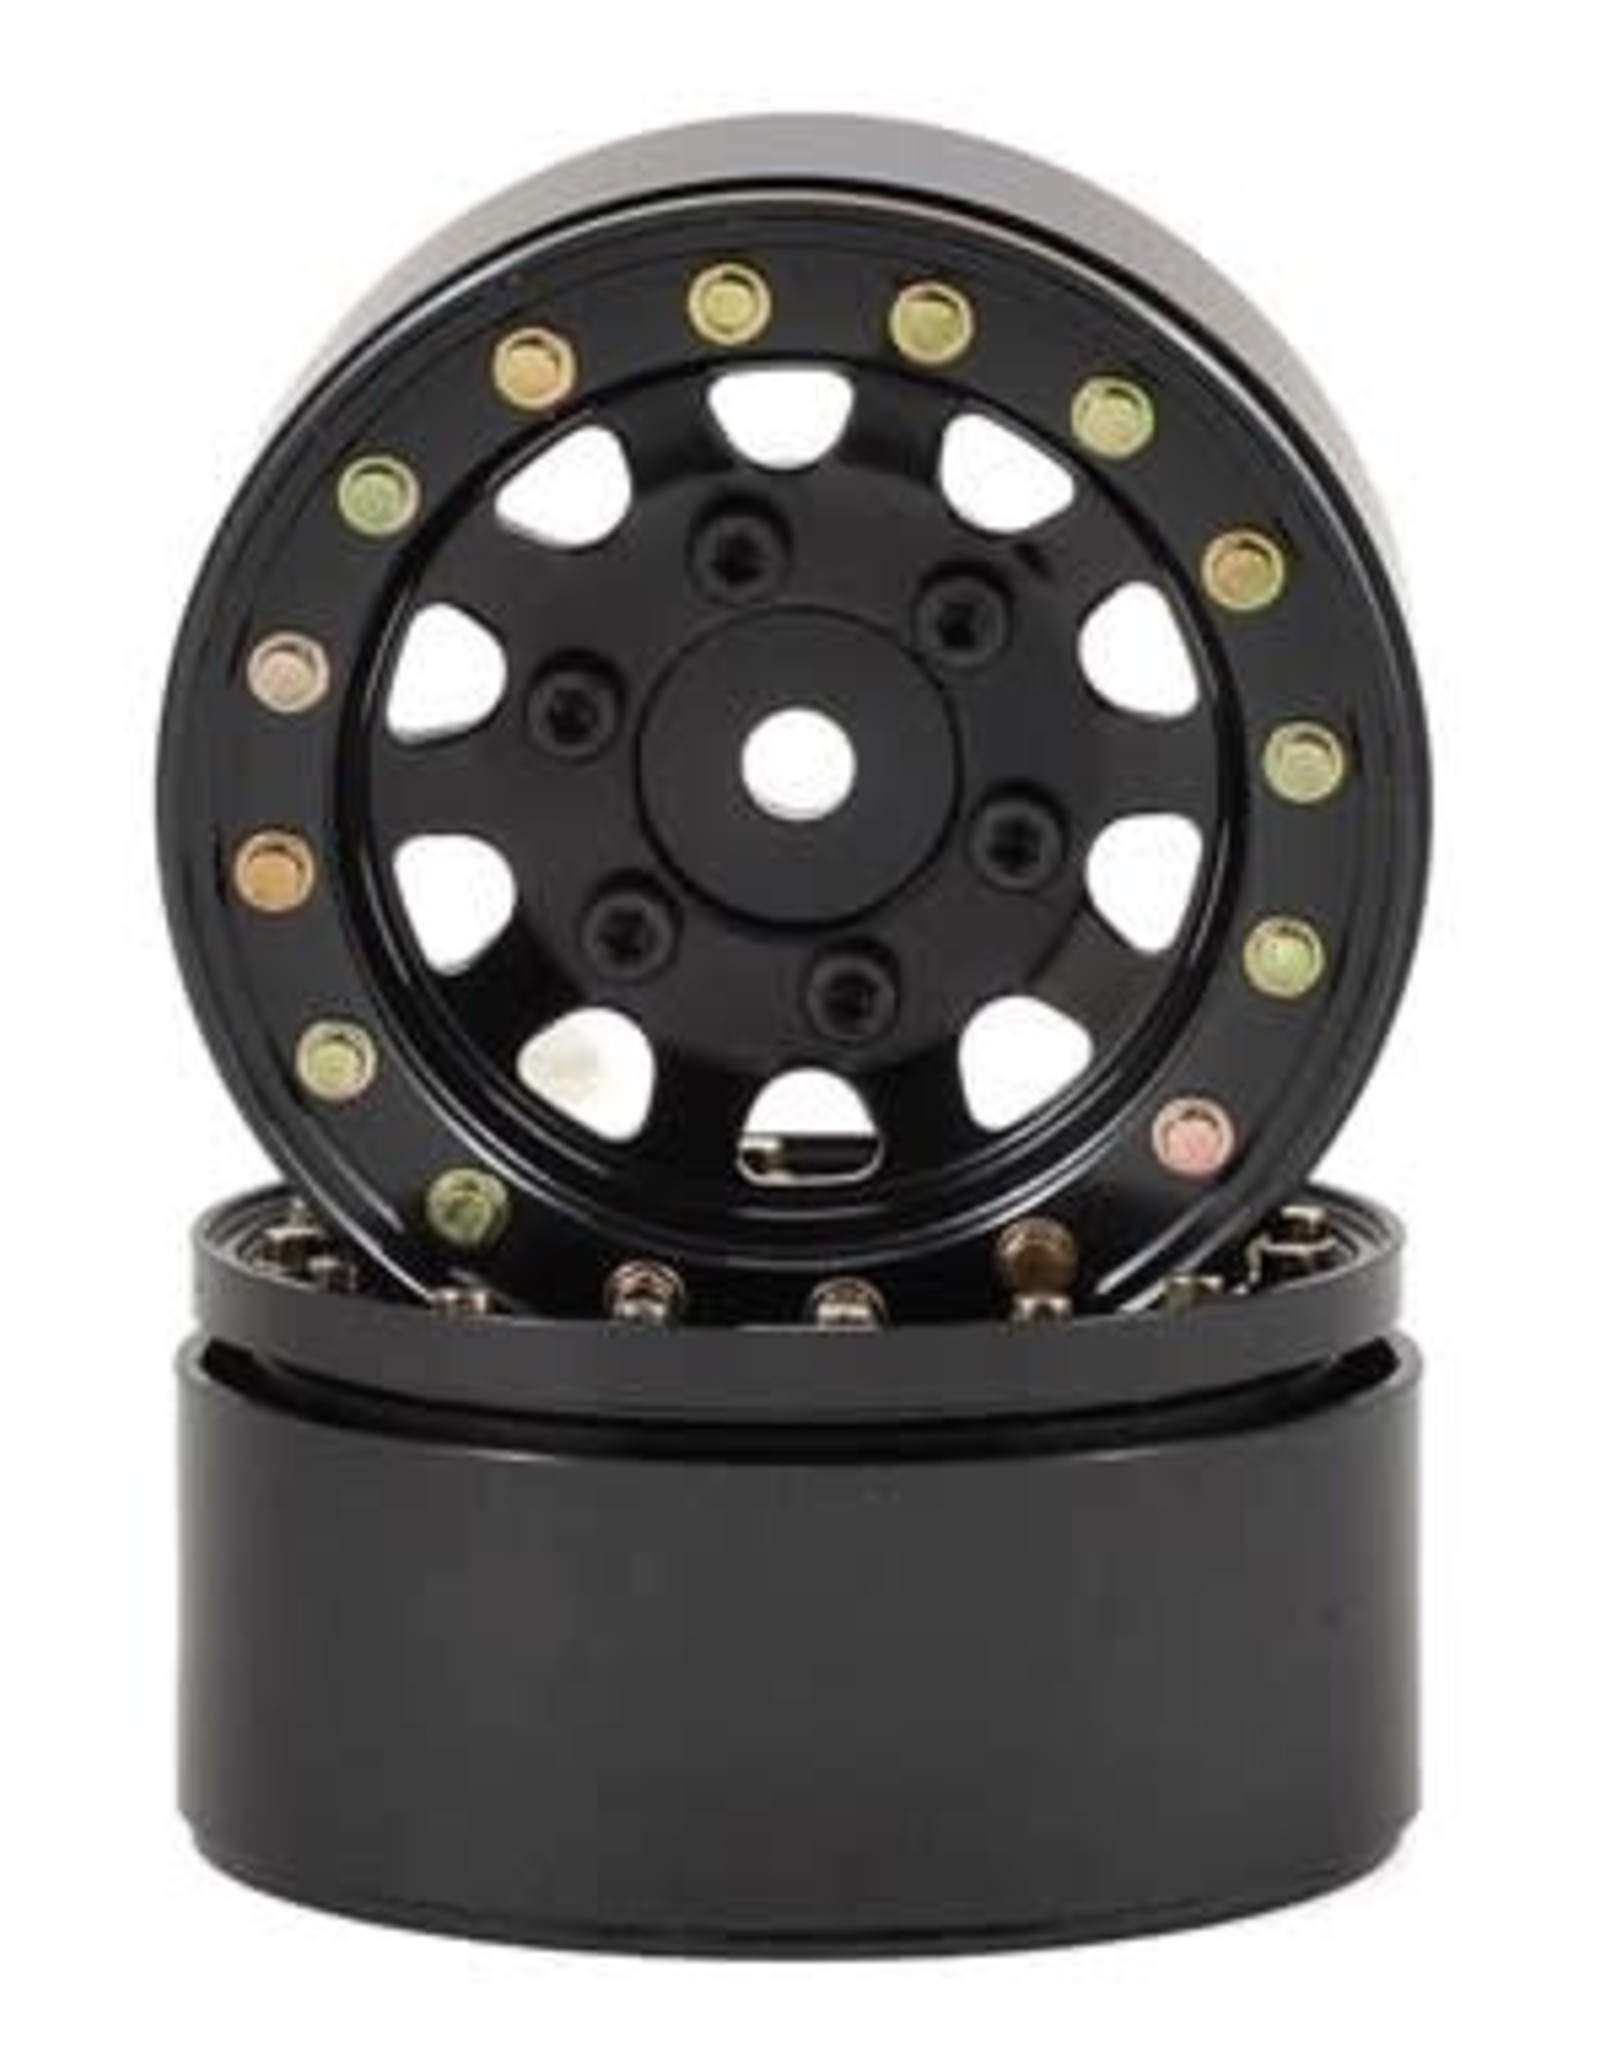 "SSD SSD RC D Hole 1.55"" Steel Beadlock Crawler Wheels (Black) (2)"